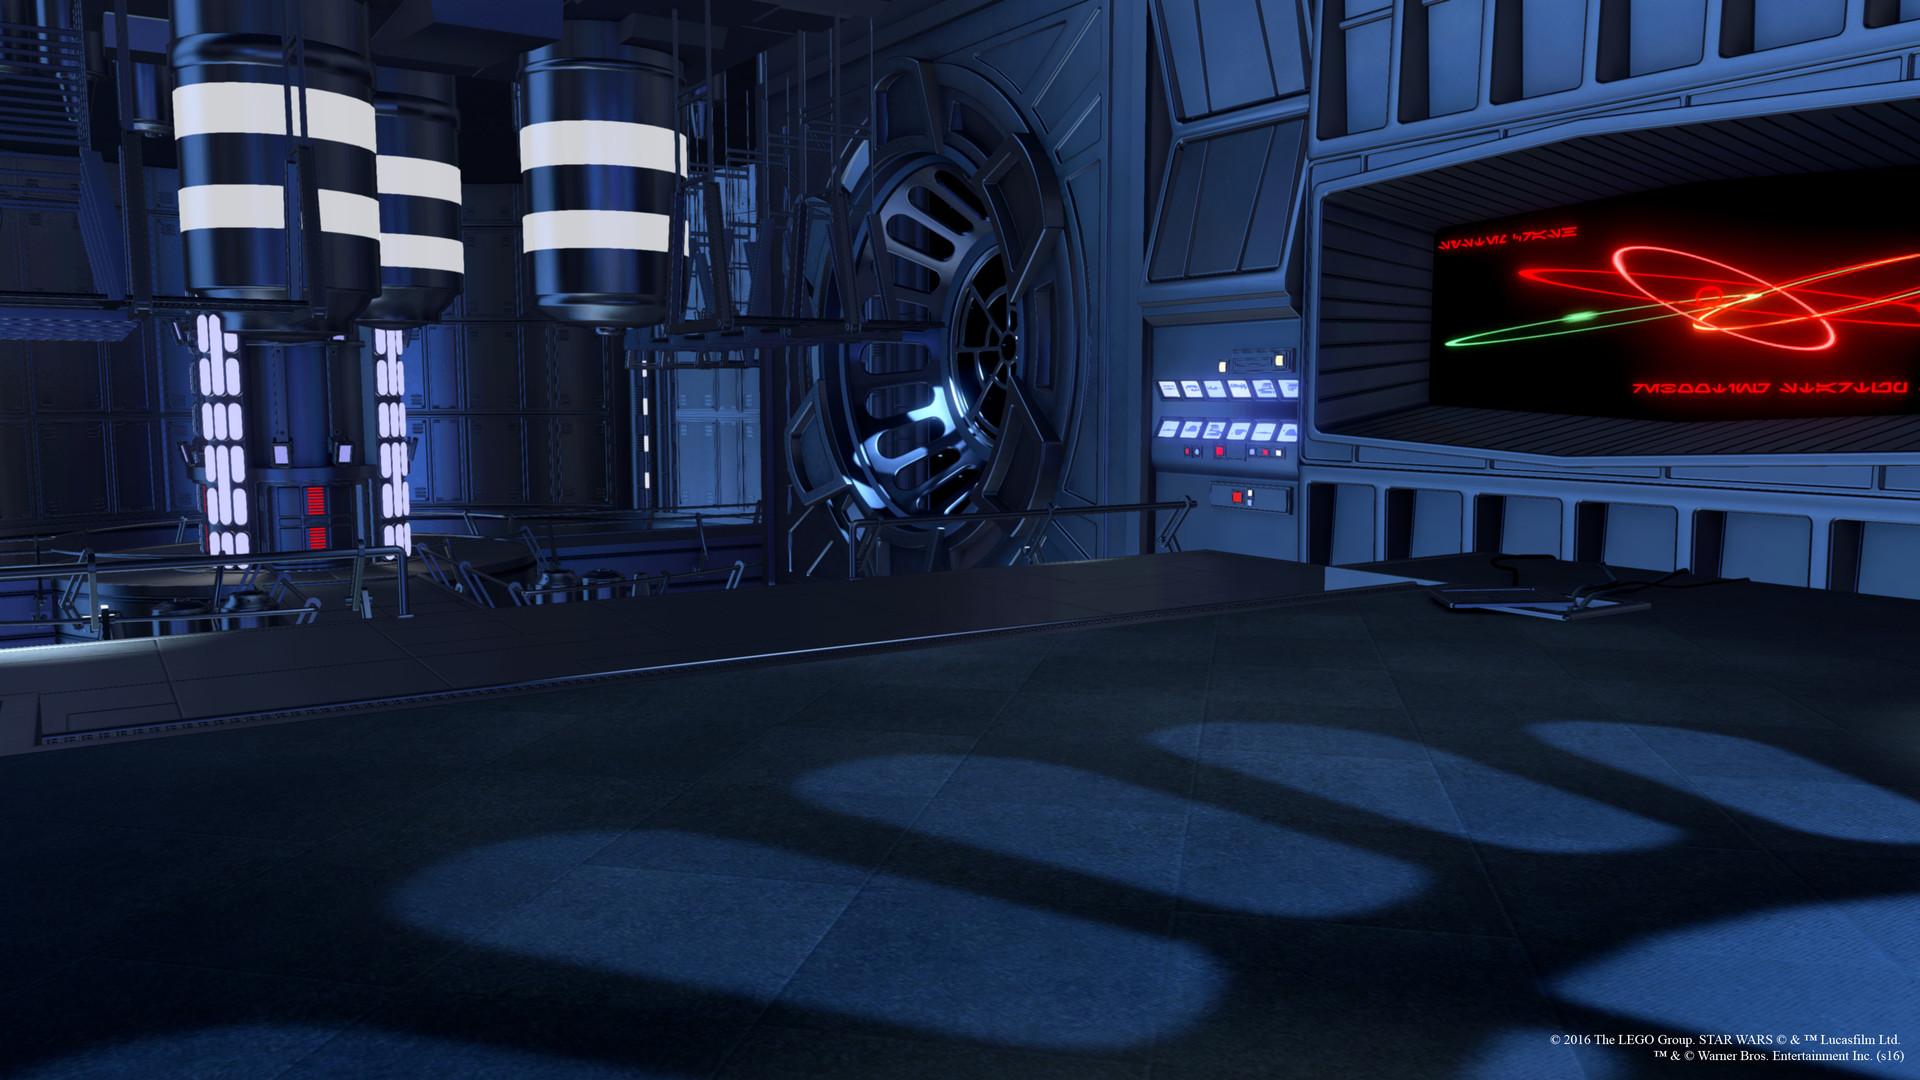 Daljit Singh Lego Star Wars The Force Awakens Emperor S Throne Room